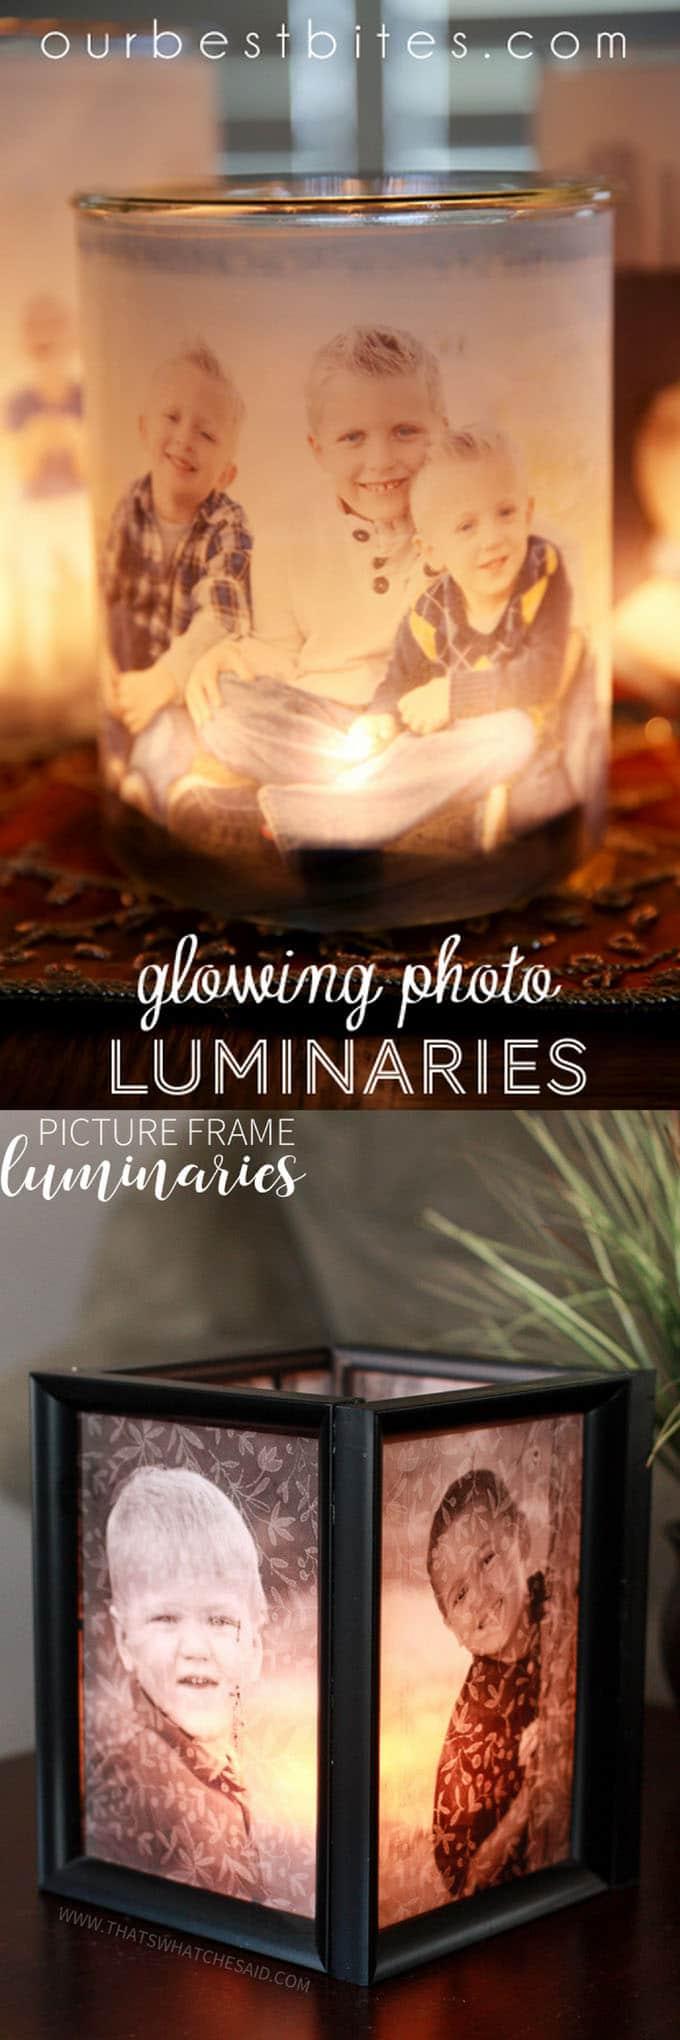 18-family-photos-gifts-decor-apieceofrainbowblog-2